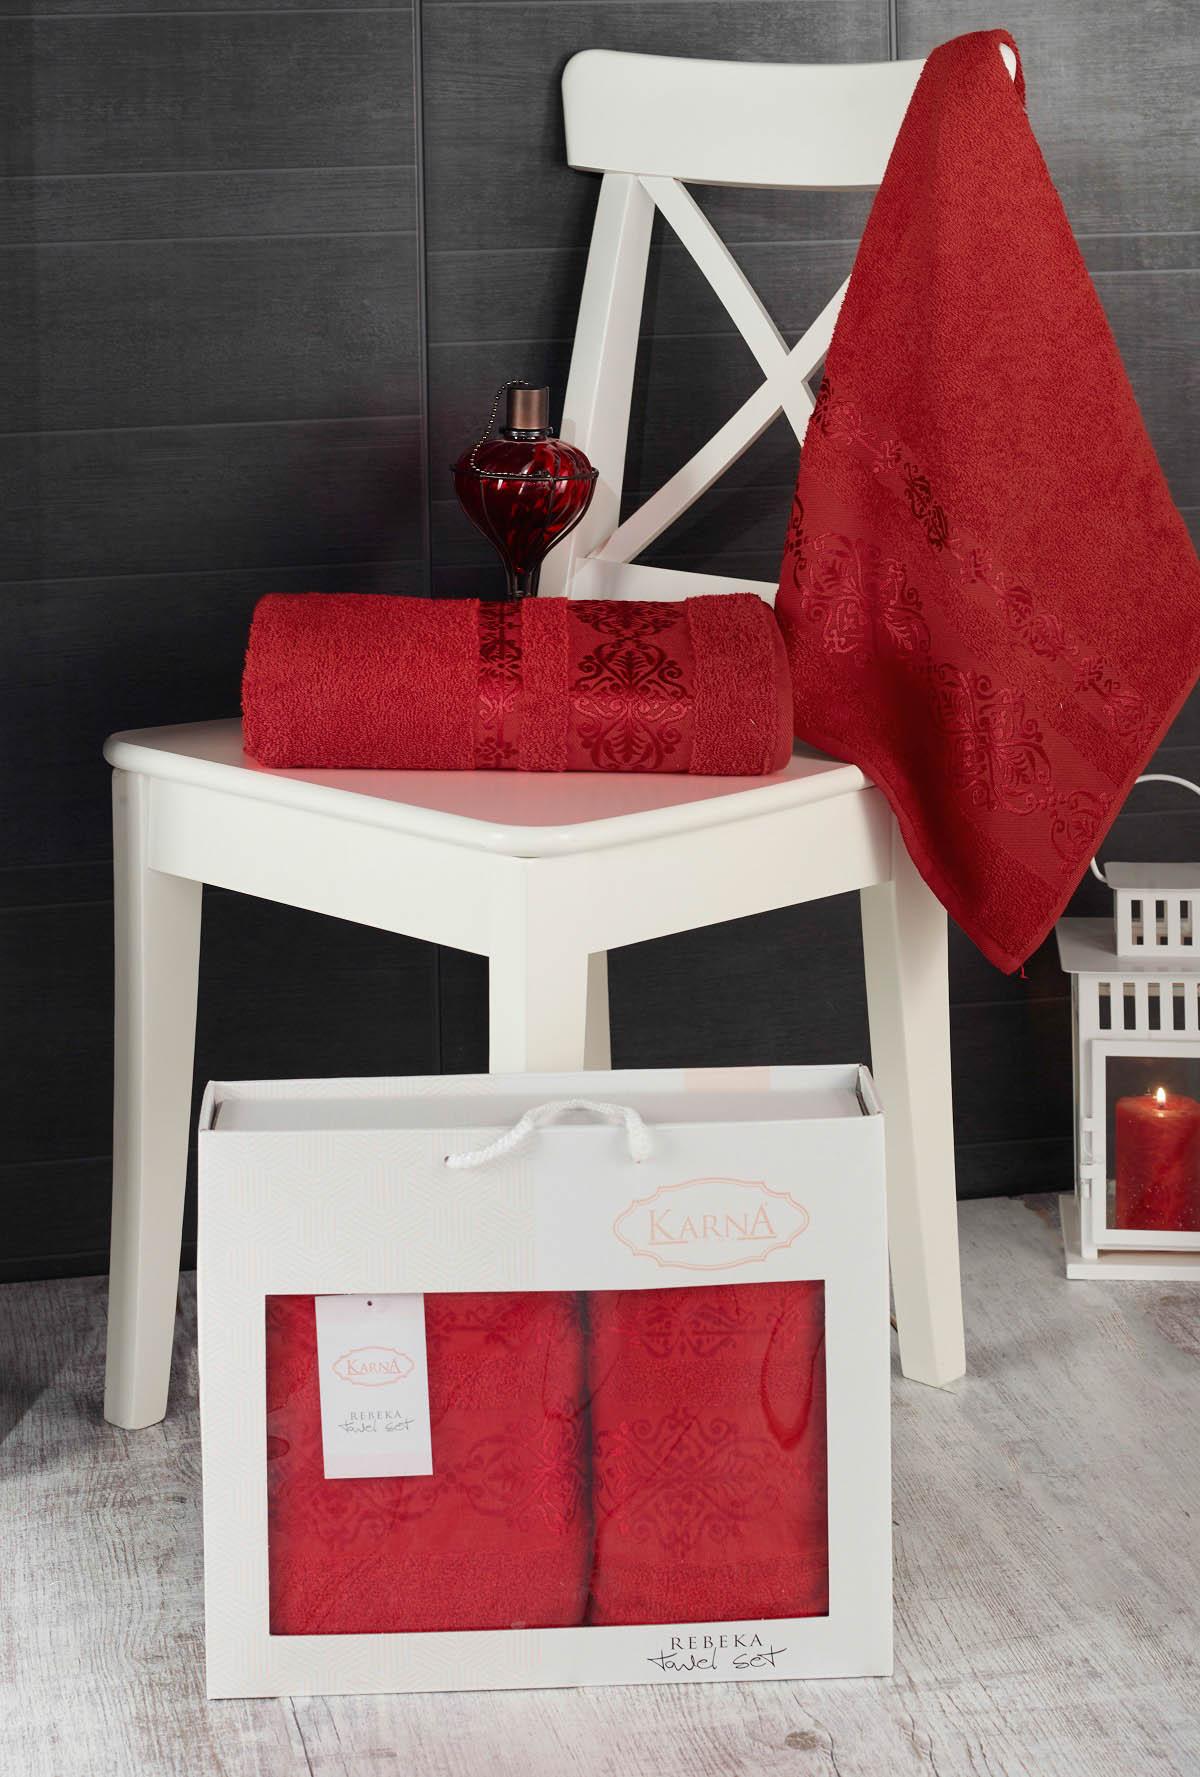 Полотенца Karna Полотенце Rebeca Цвет: Красный (50х90 см,70х140 см) karna karna полотенце innes цвет красный 70х140 см